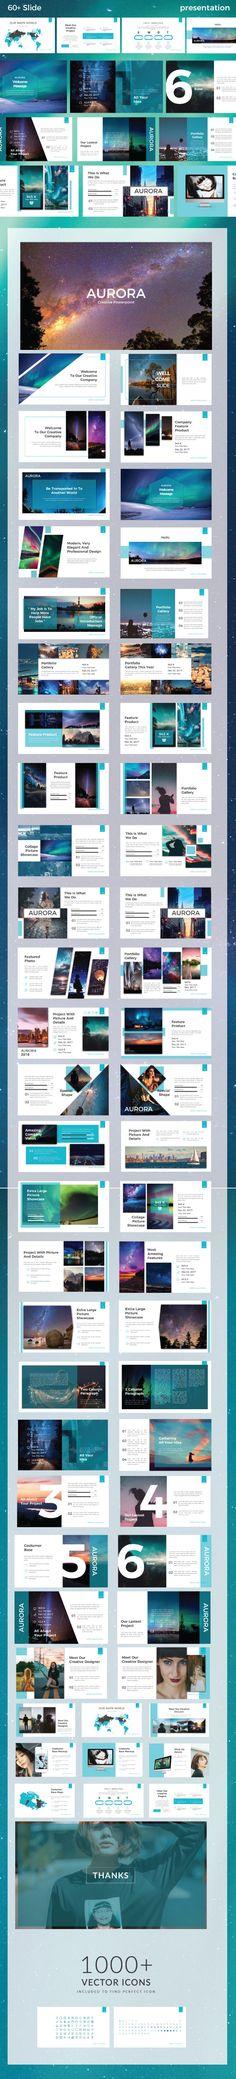 Aurora #Presentation Template - Business #PowerPoint Templates